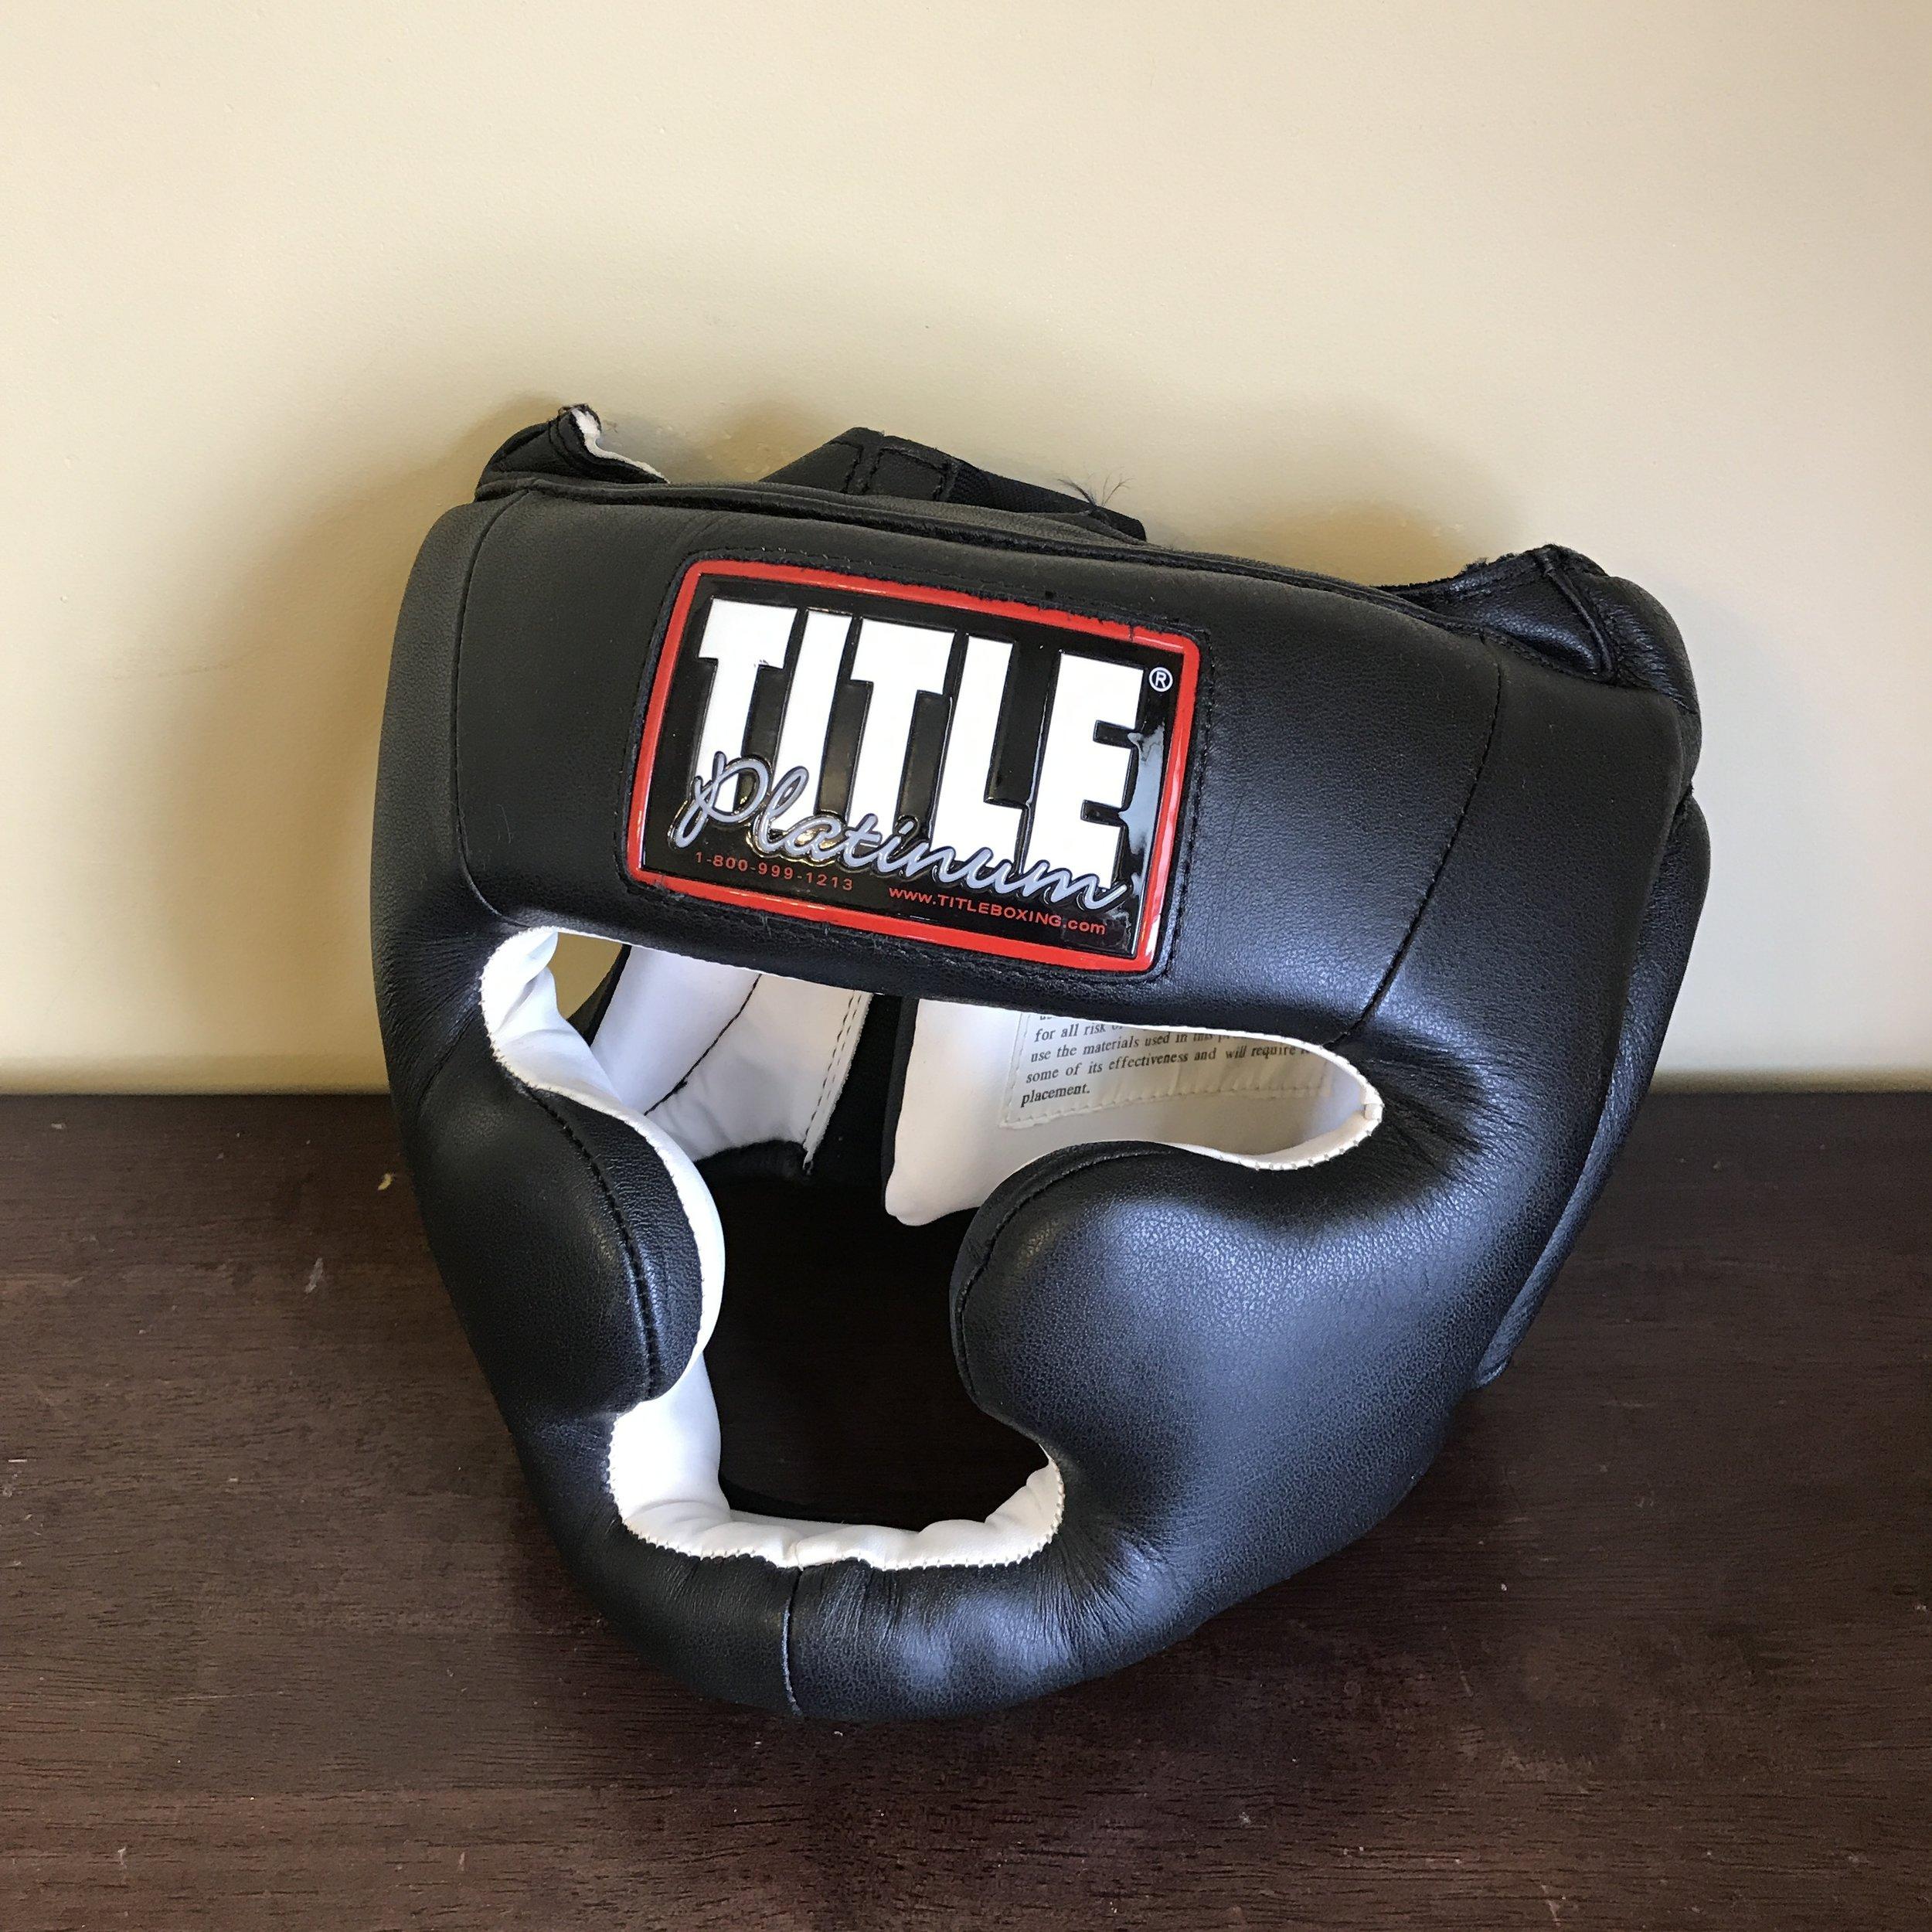 Title boxing headgear